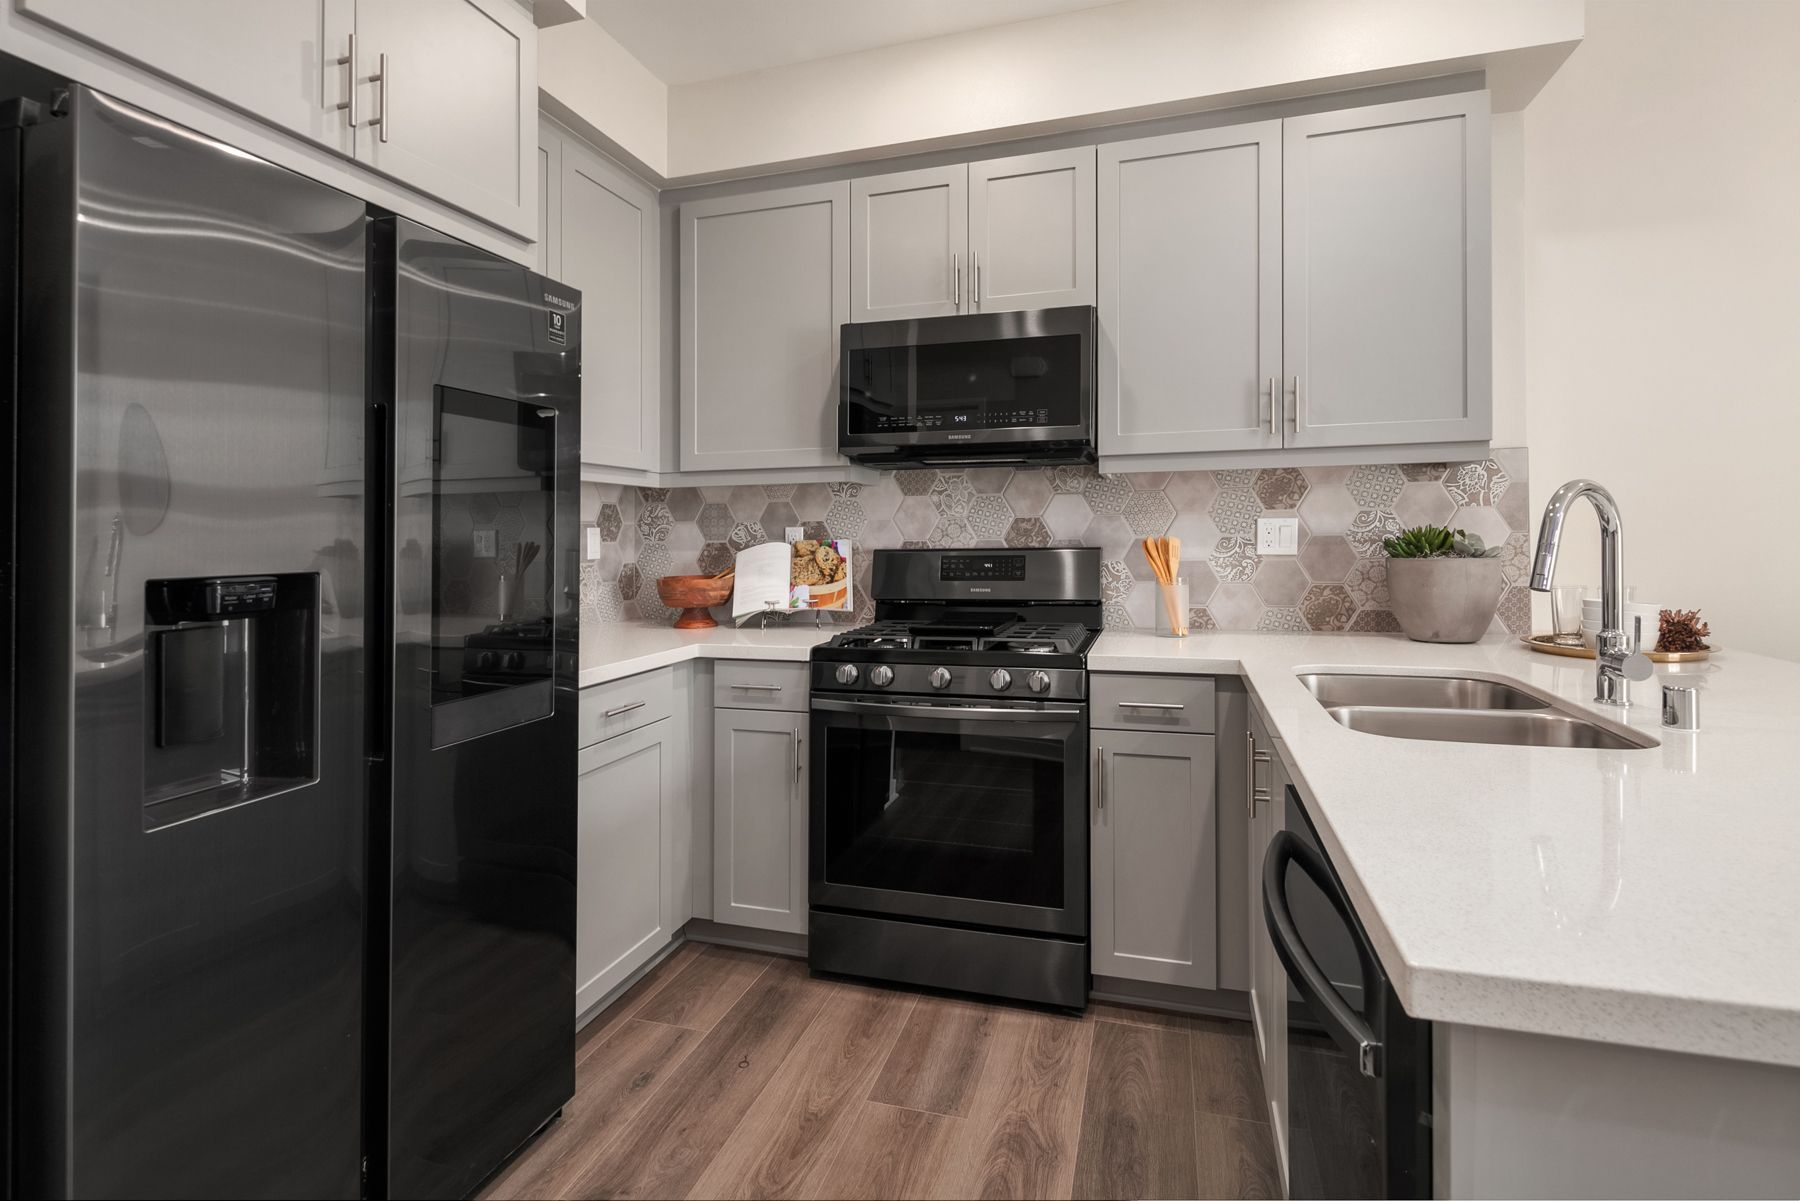 Kitchen featured in the Floor Plan 2 By RC Homes Inc in Riverside-San Bernardino, CA